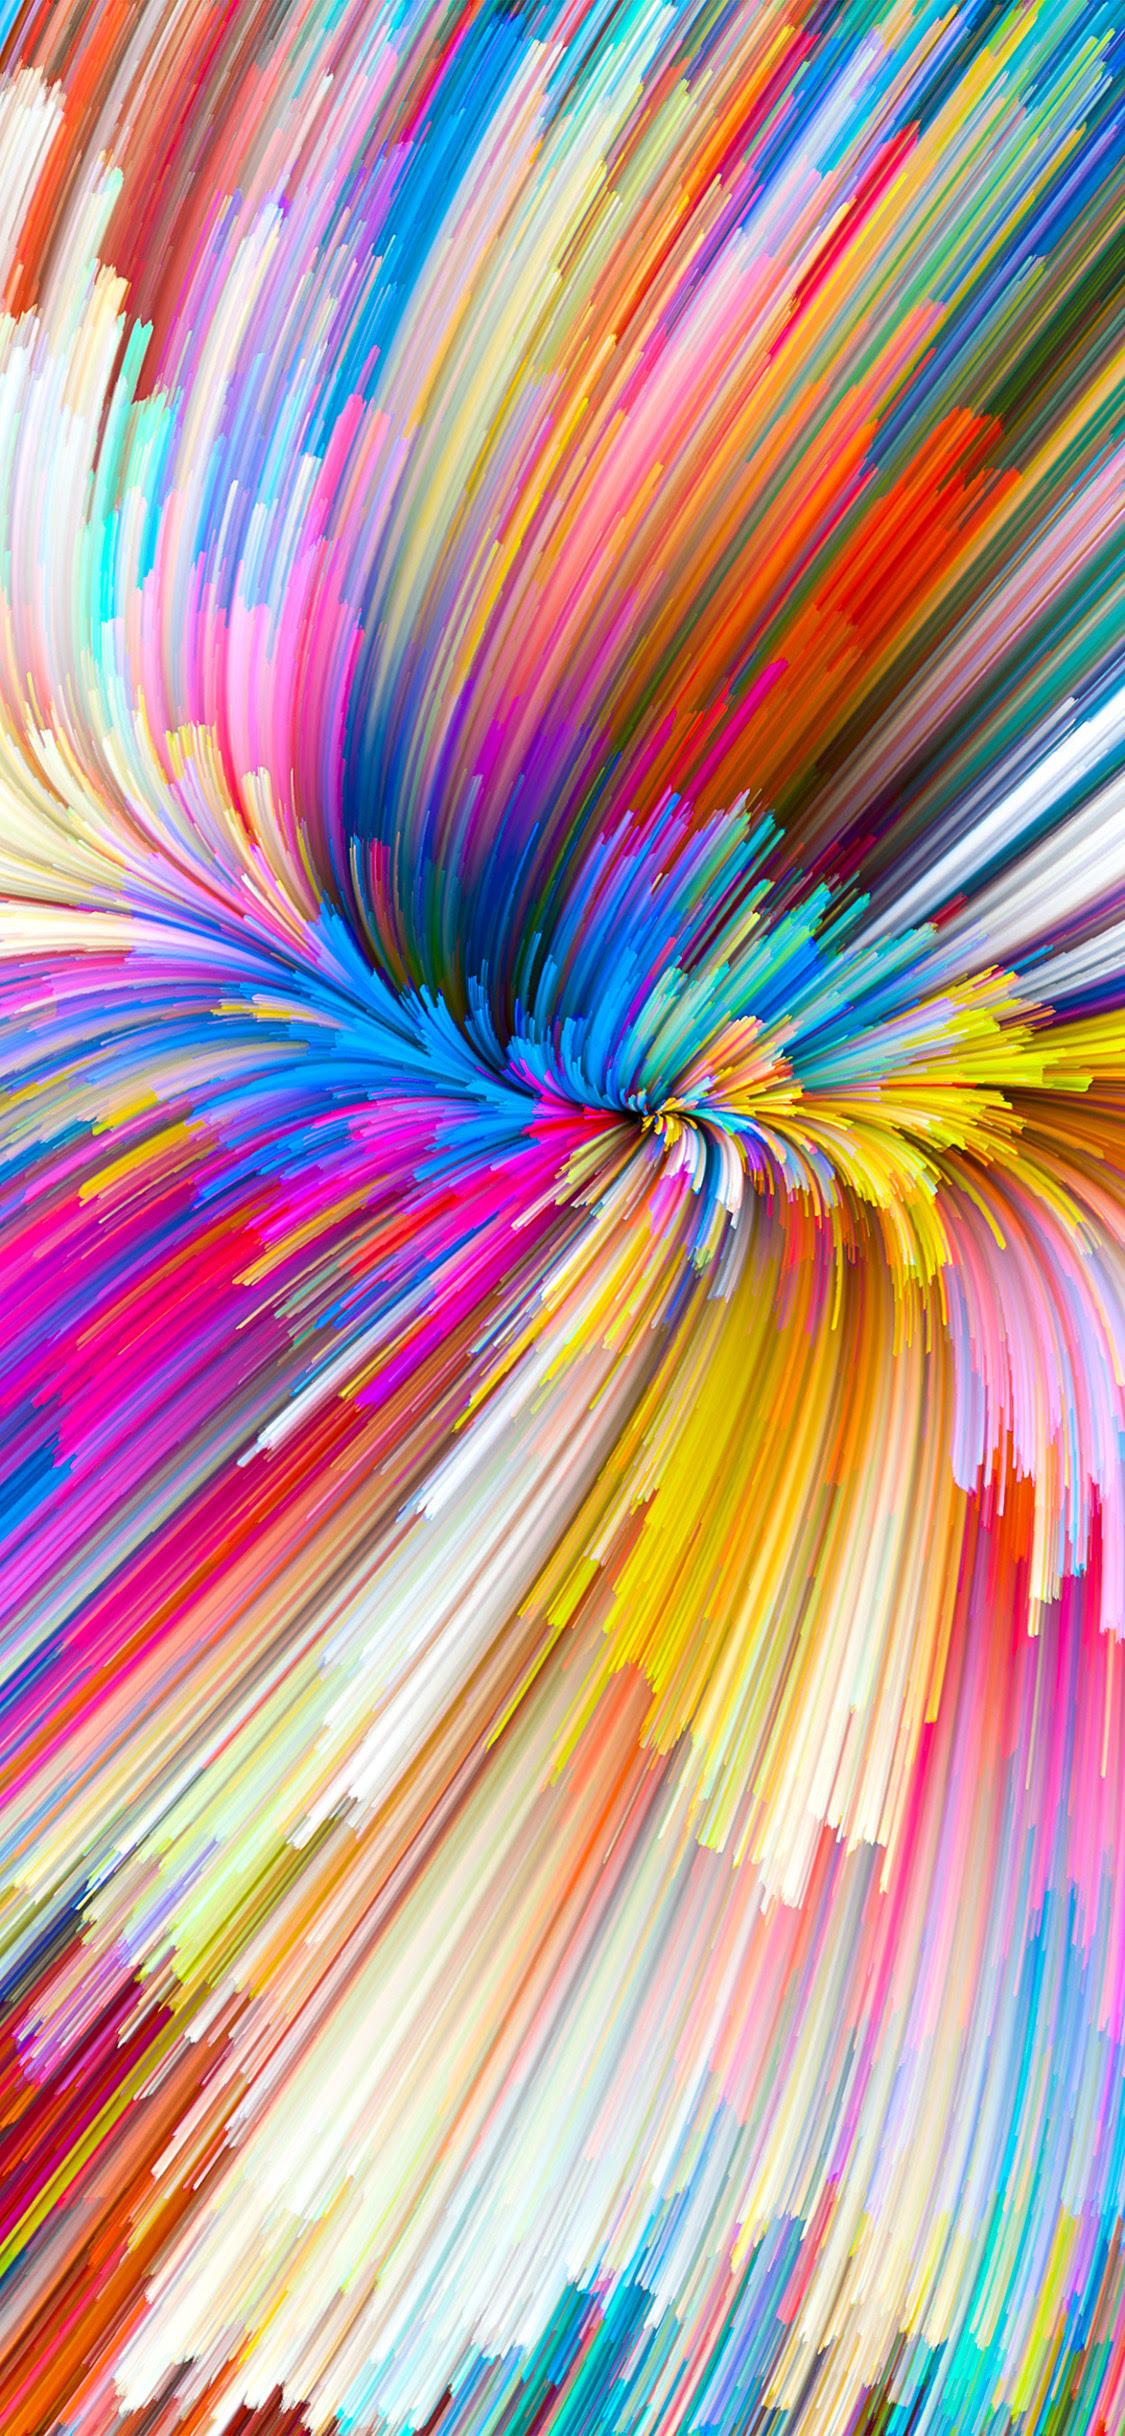 Wallpaper Iphone Colorful Iphone X Wallpaper